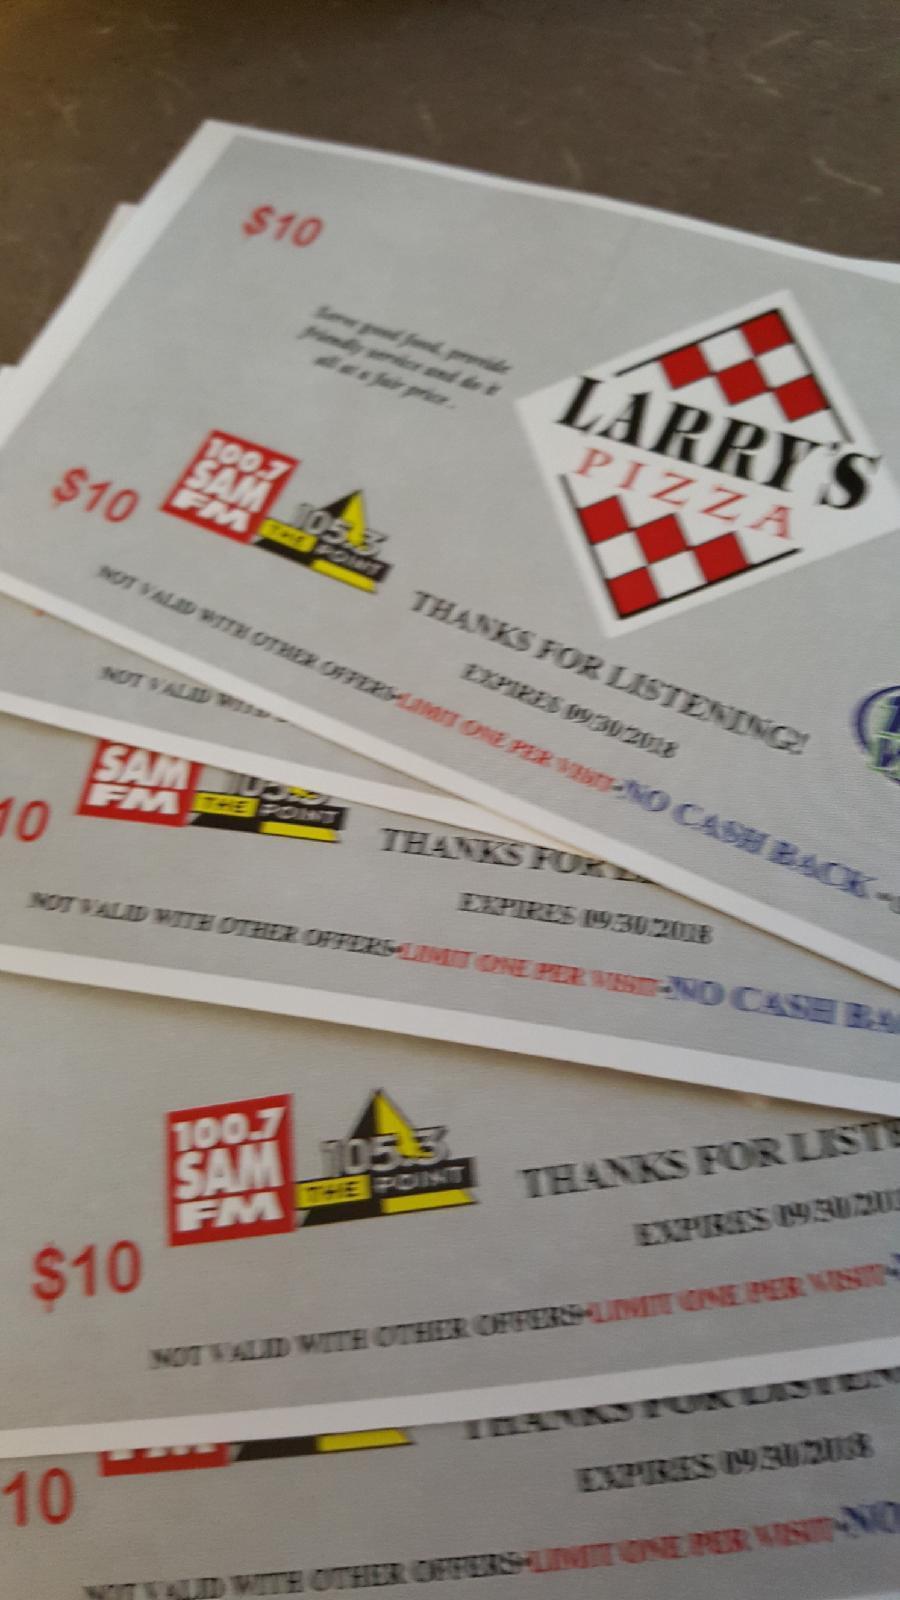 Larry's Pizza Passes